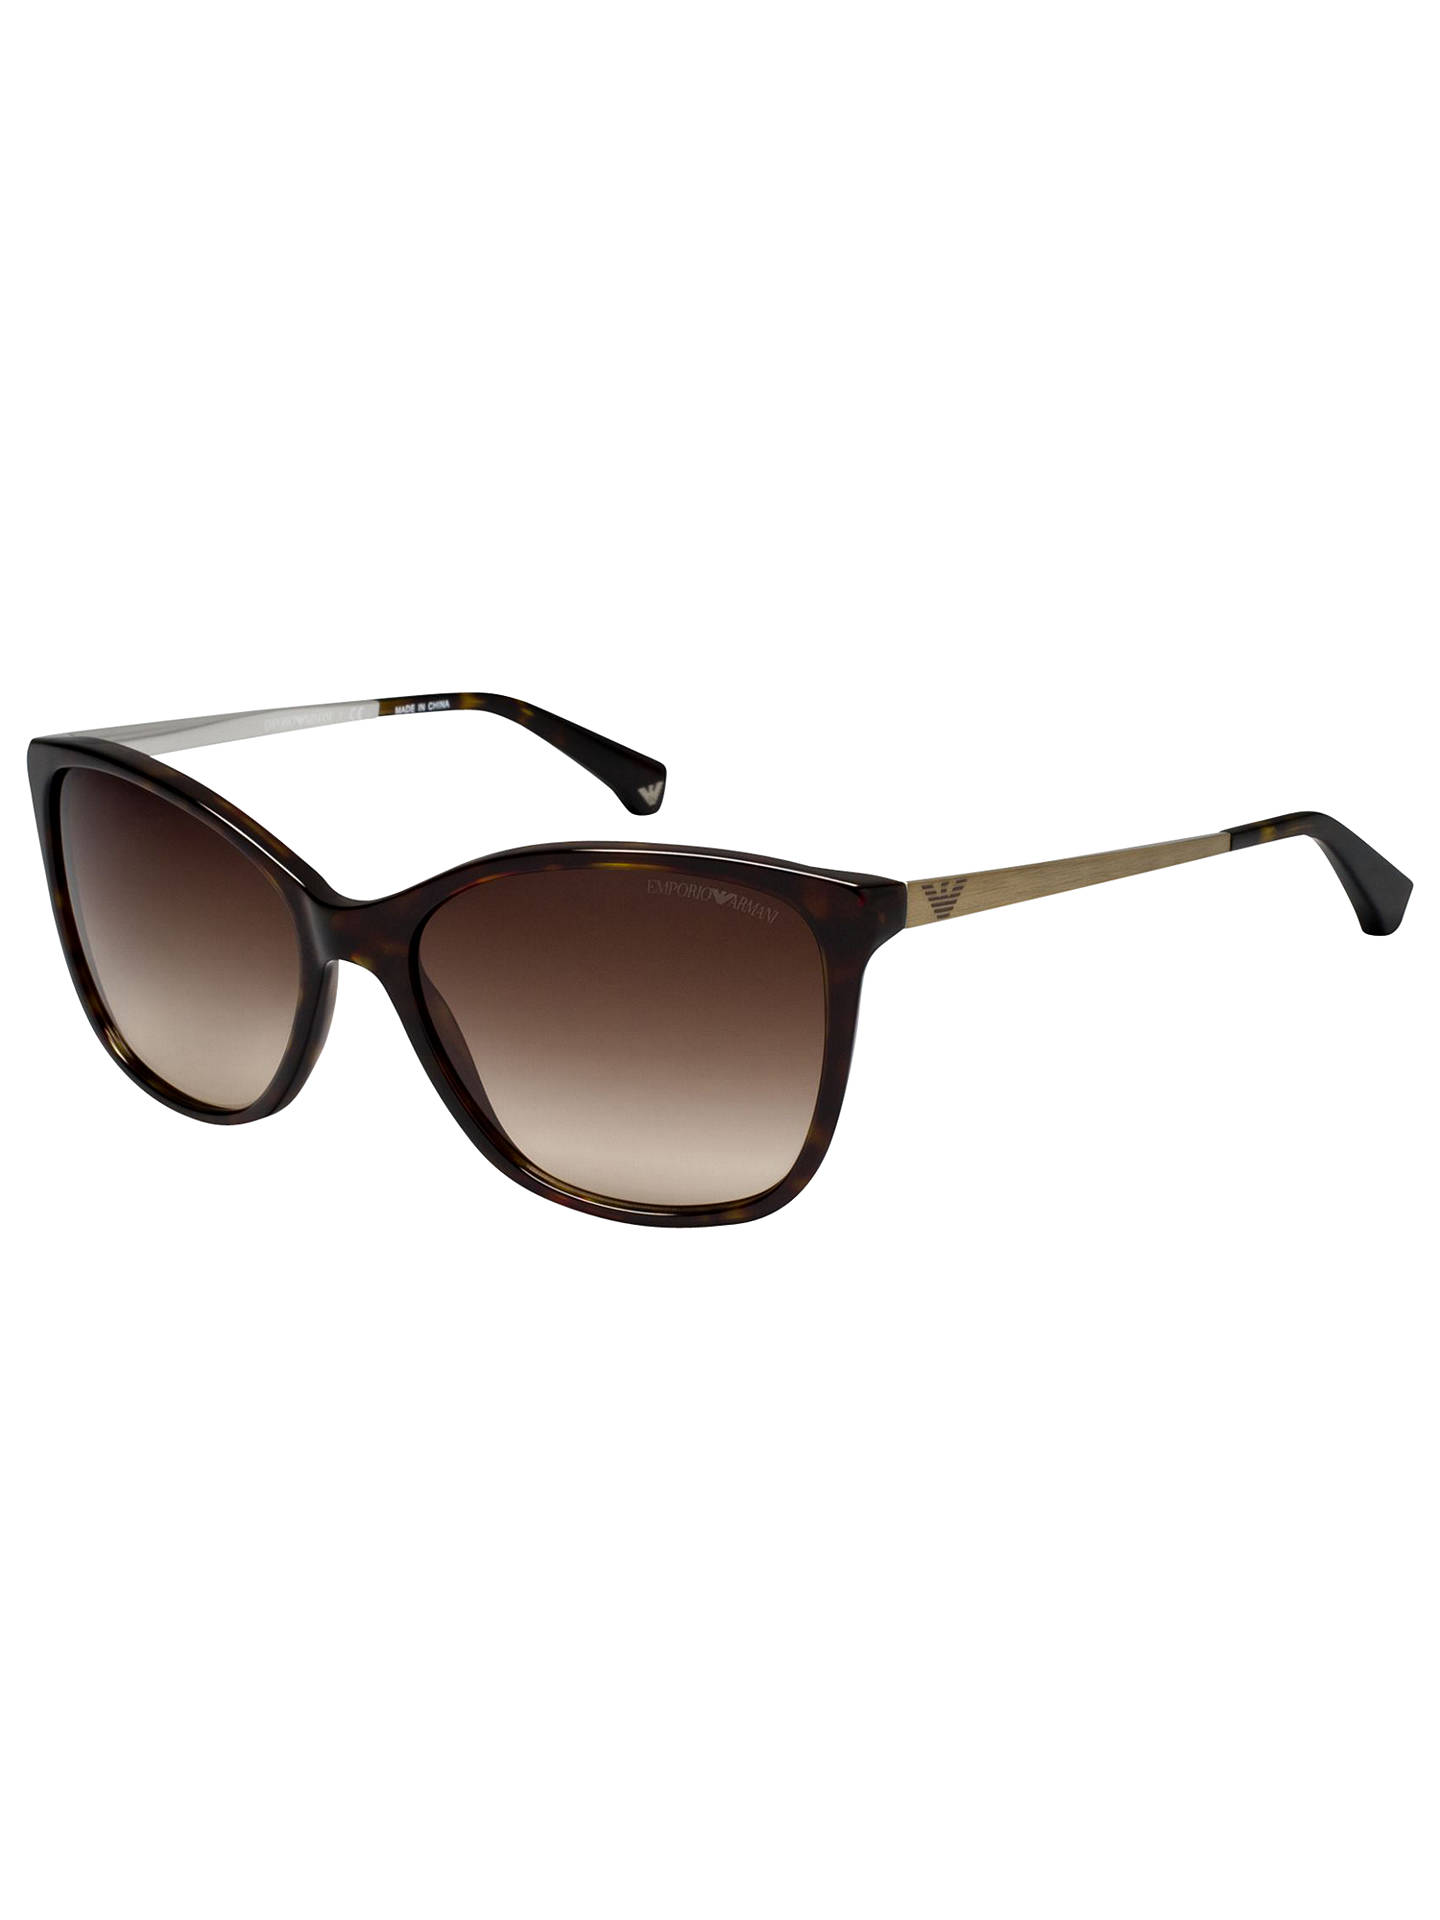 ac7c3b0f692 Emporio Armani EA4025 Cat s Eye Sunglasses at John Lewis   Partners